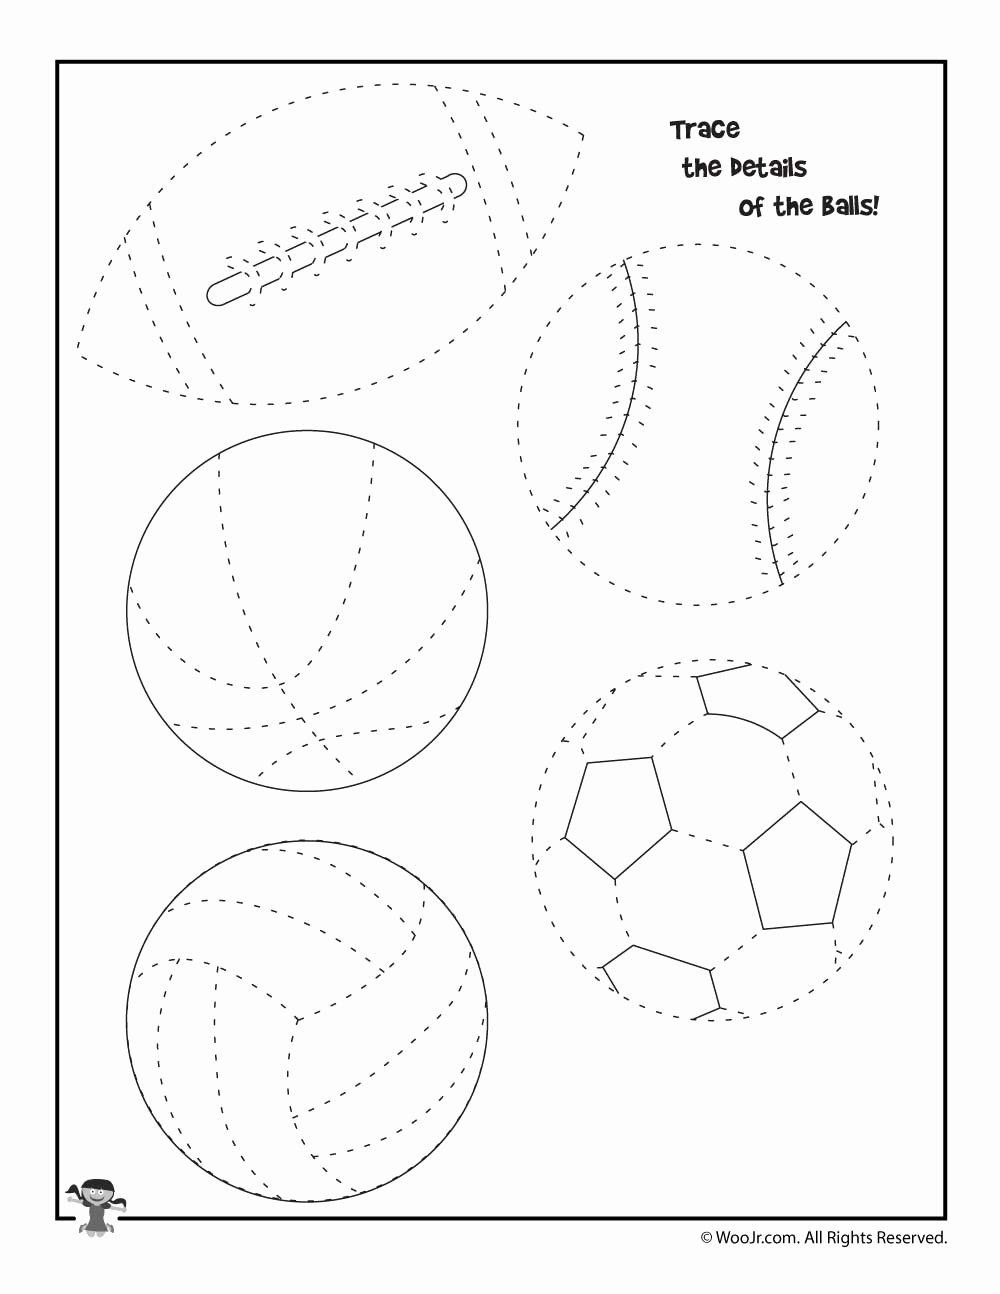 Sports Worksheets for Preschoolers Inspirational Summer Sports Tracing Worksheet